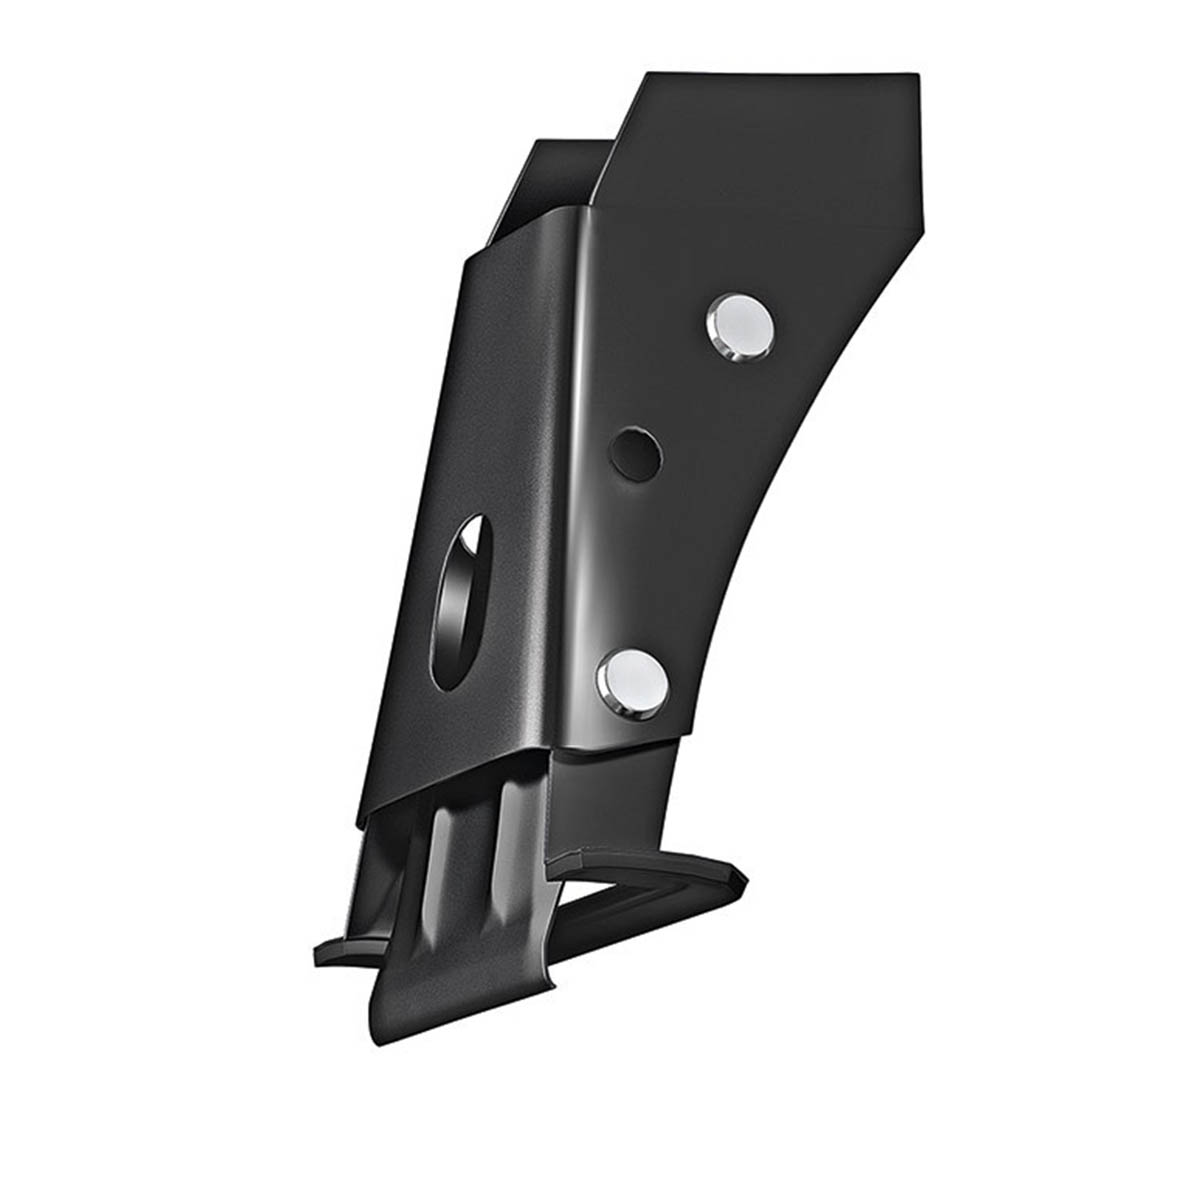 Rack de teto Clio 2004 a 2016 2 portas Long Life aço